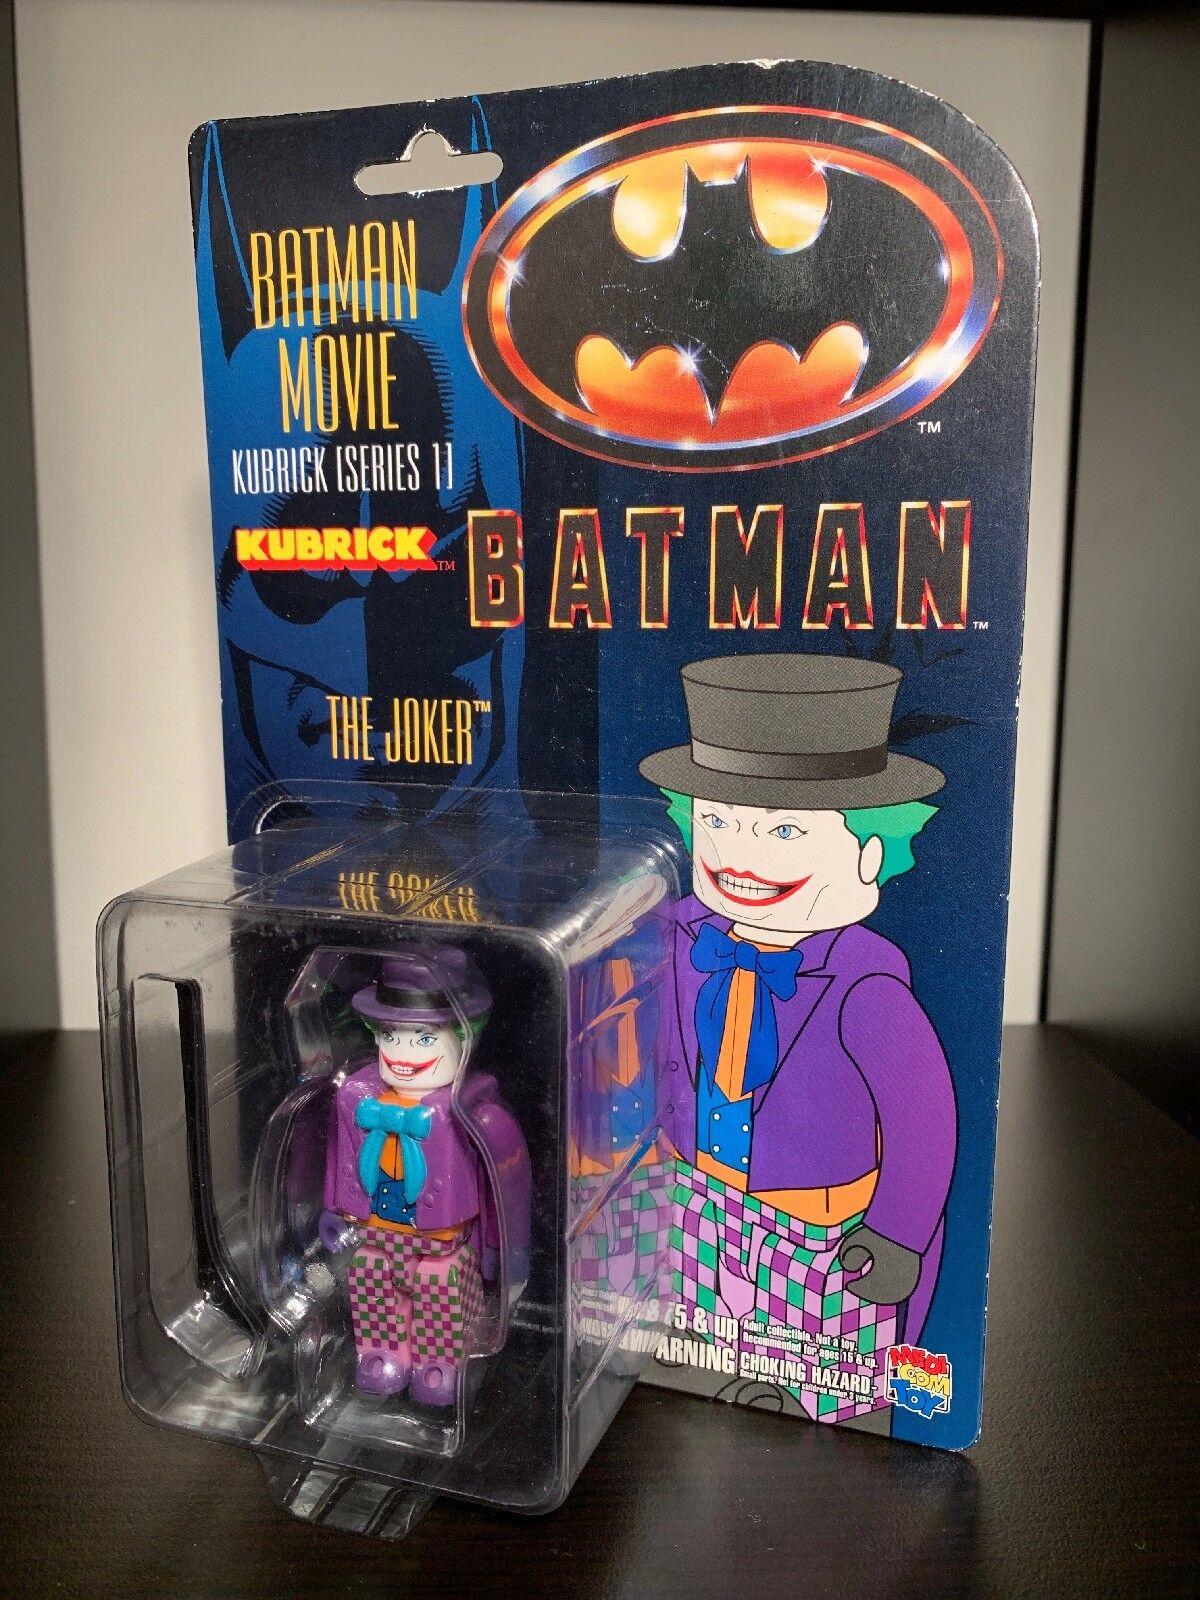 The Joker Medicom Toy Kubrick Batman 1989 Movie Gotham Knights Series DC Comics